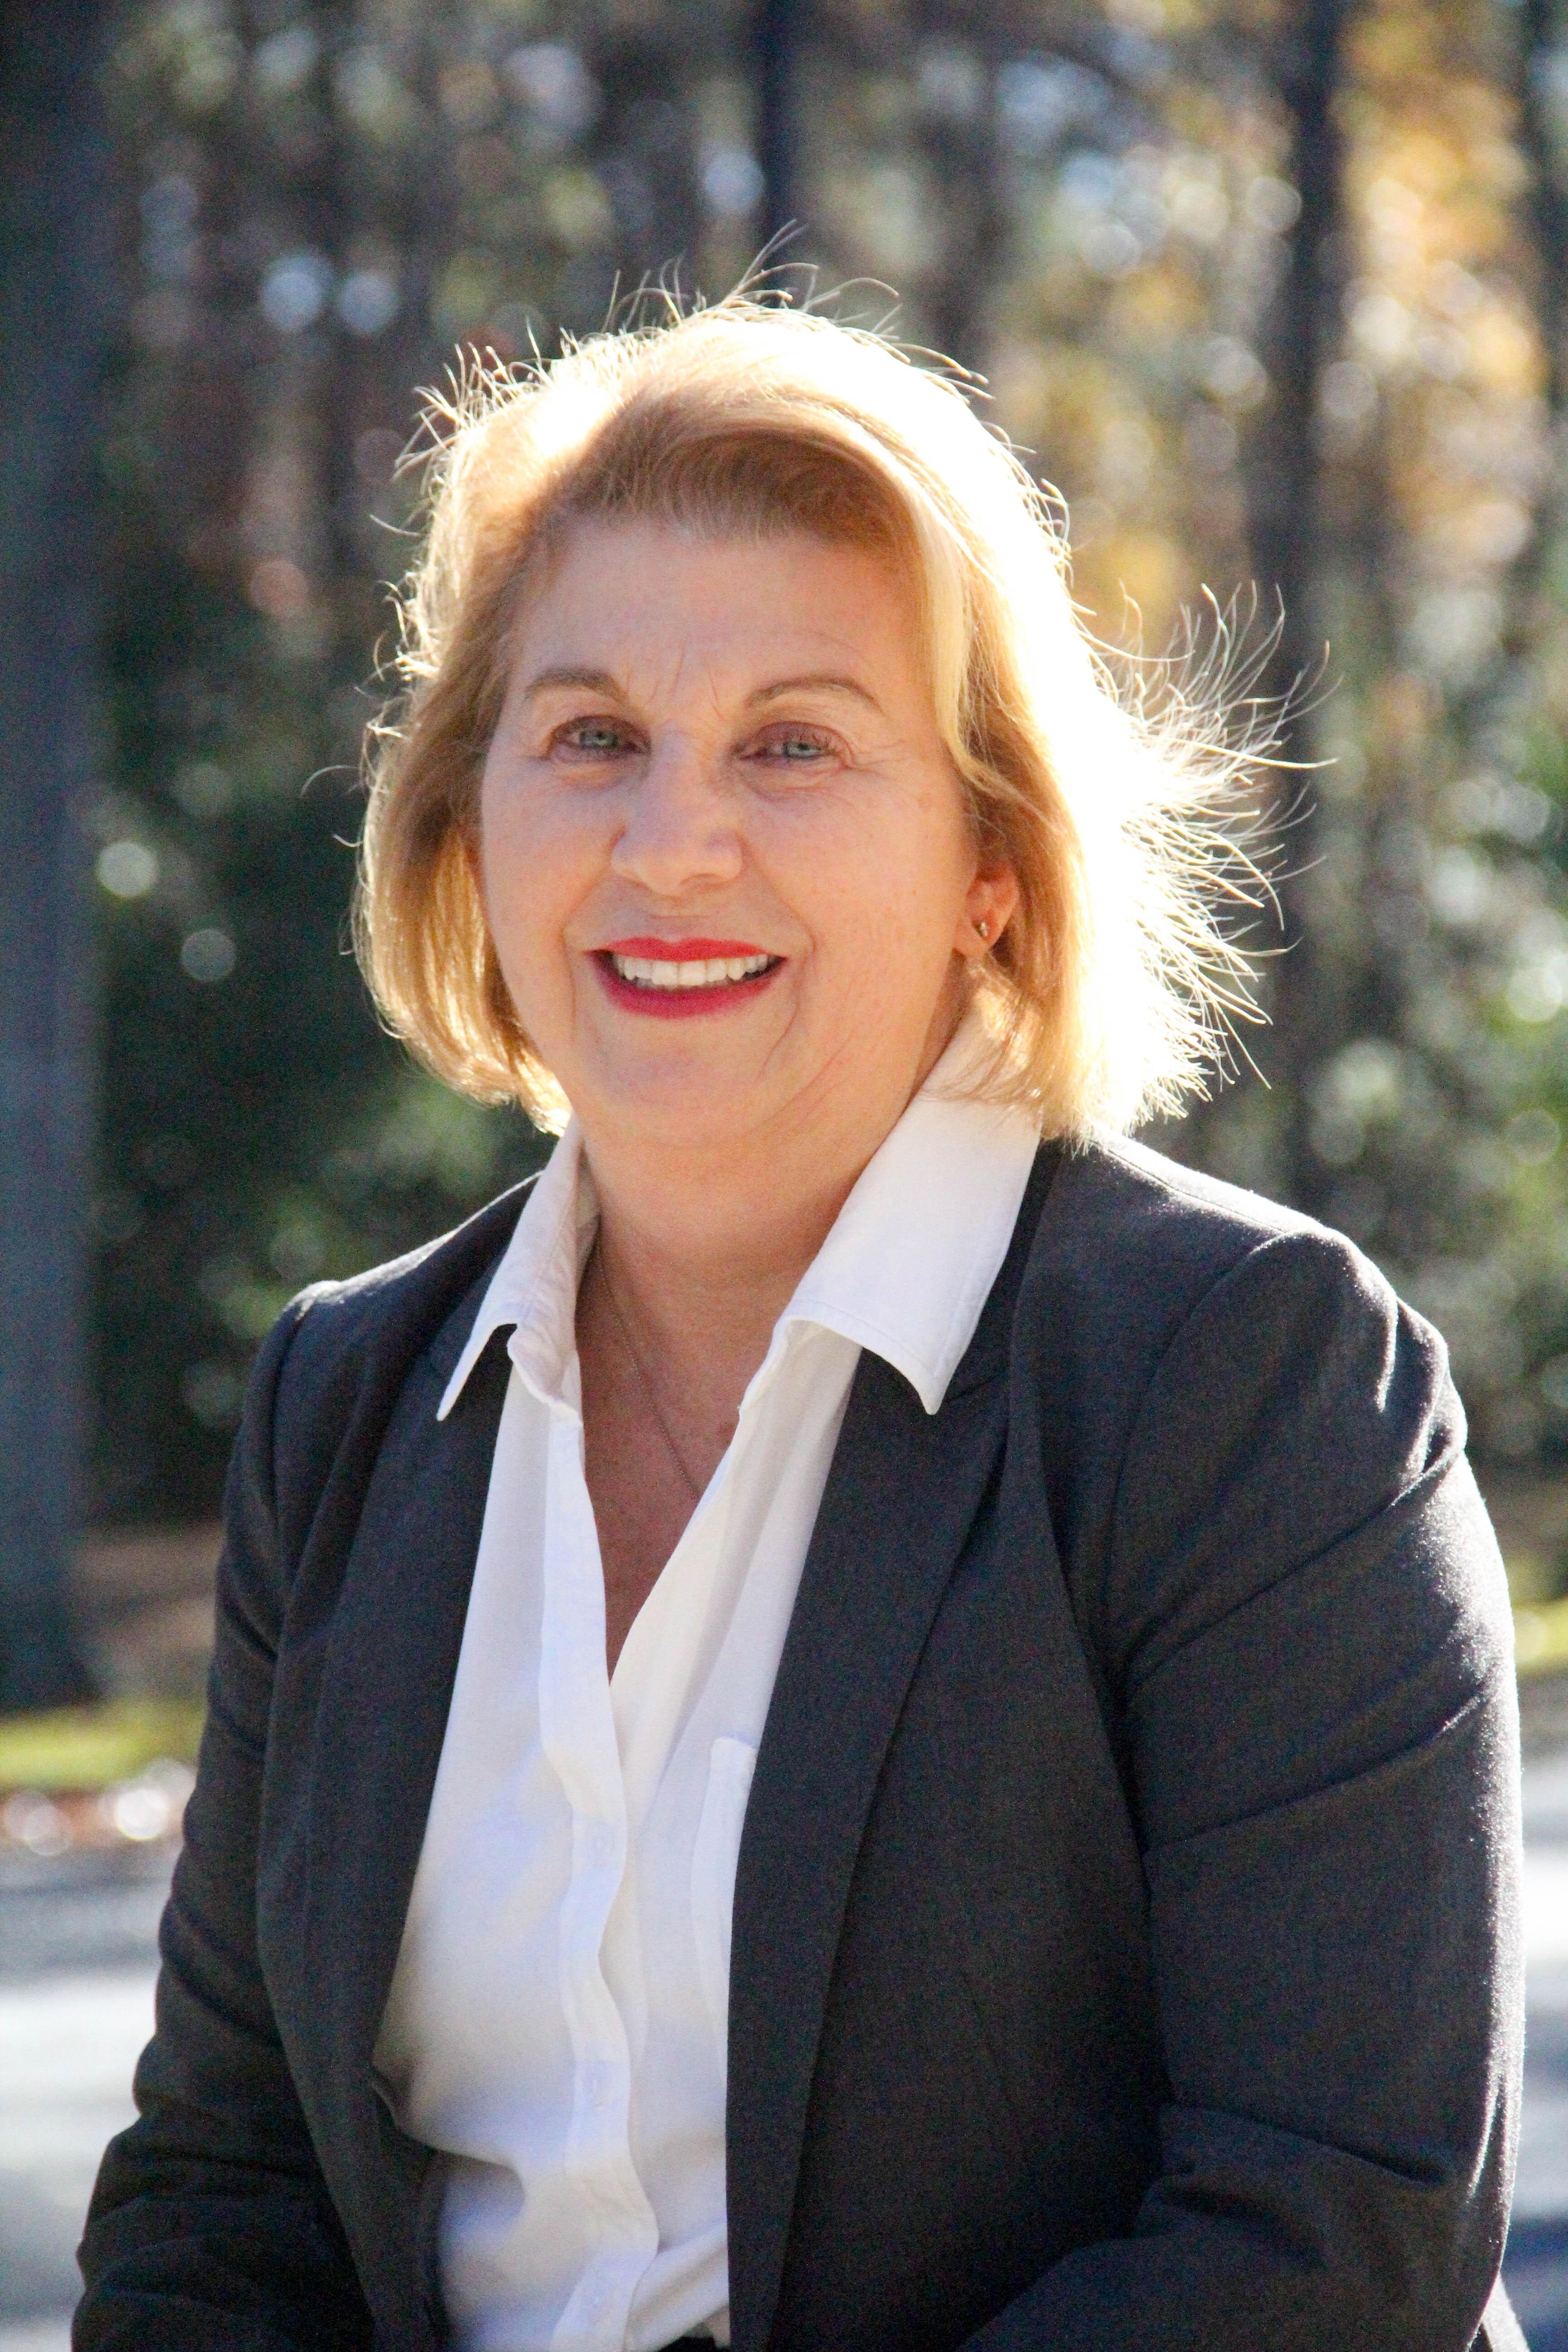 Molly Szymanski, MA, LD, SNS – Chief Operating Officer